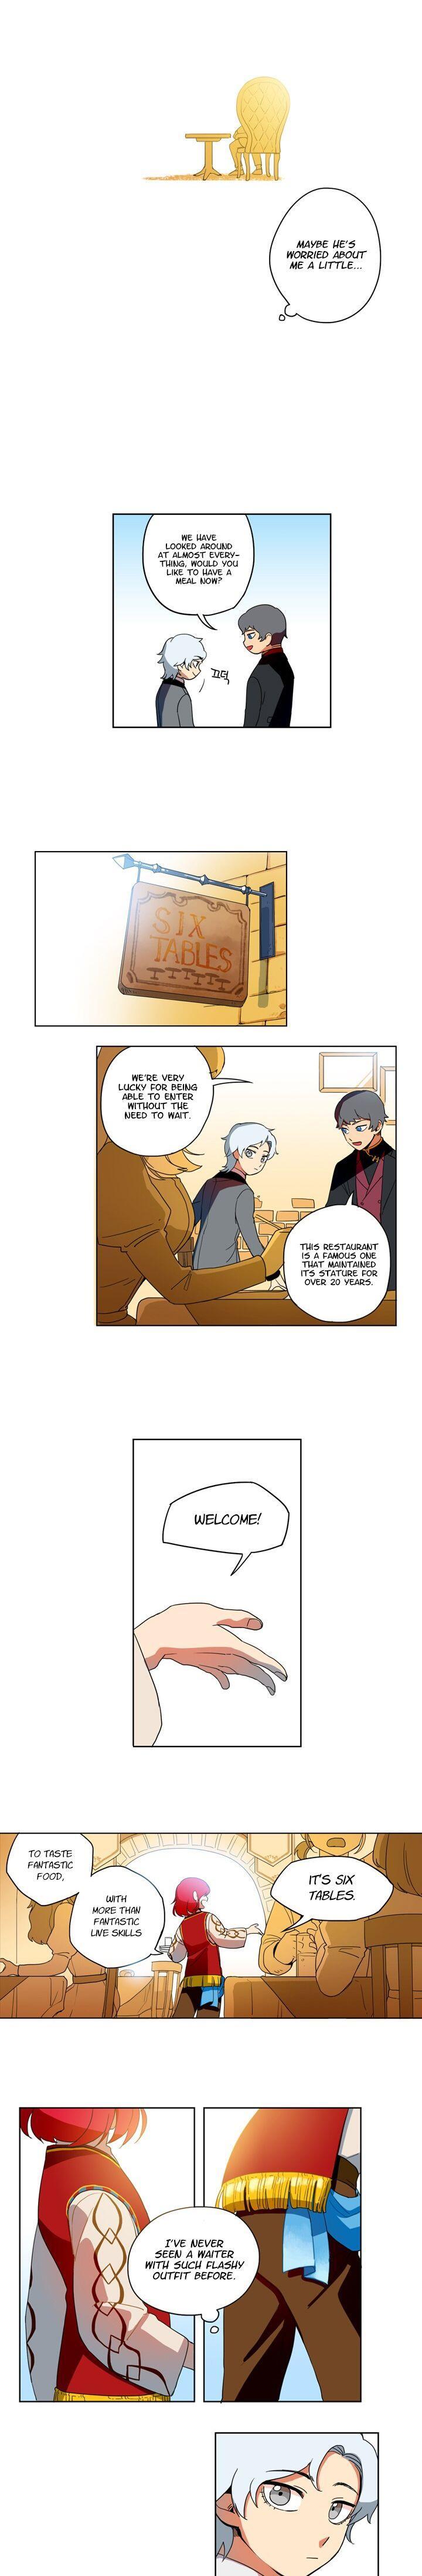 Pendant Of The Elemental Chapter 2 page 6 - Mangakakalots.com